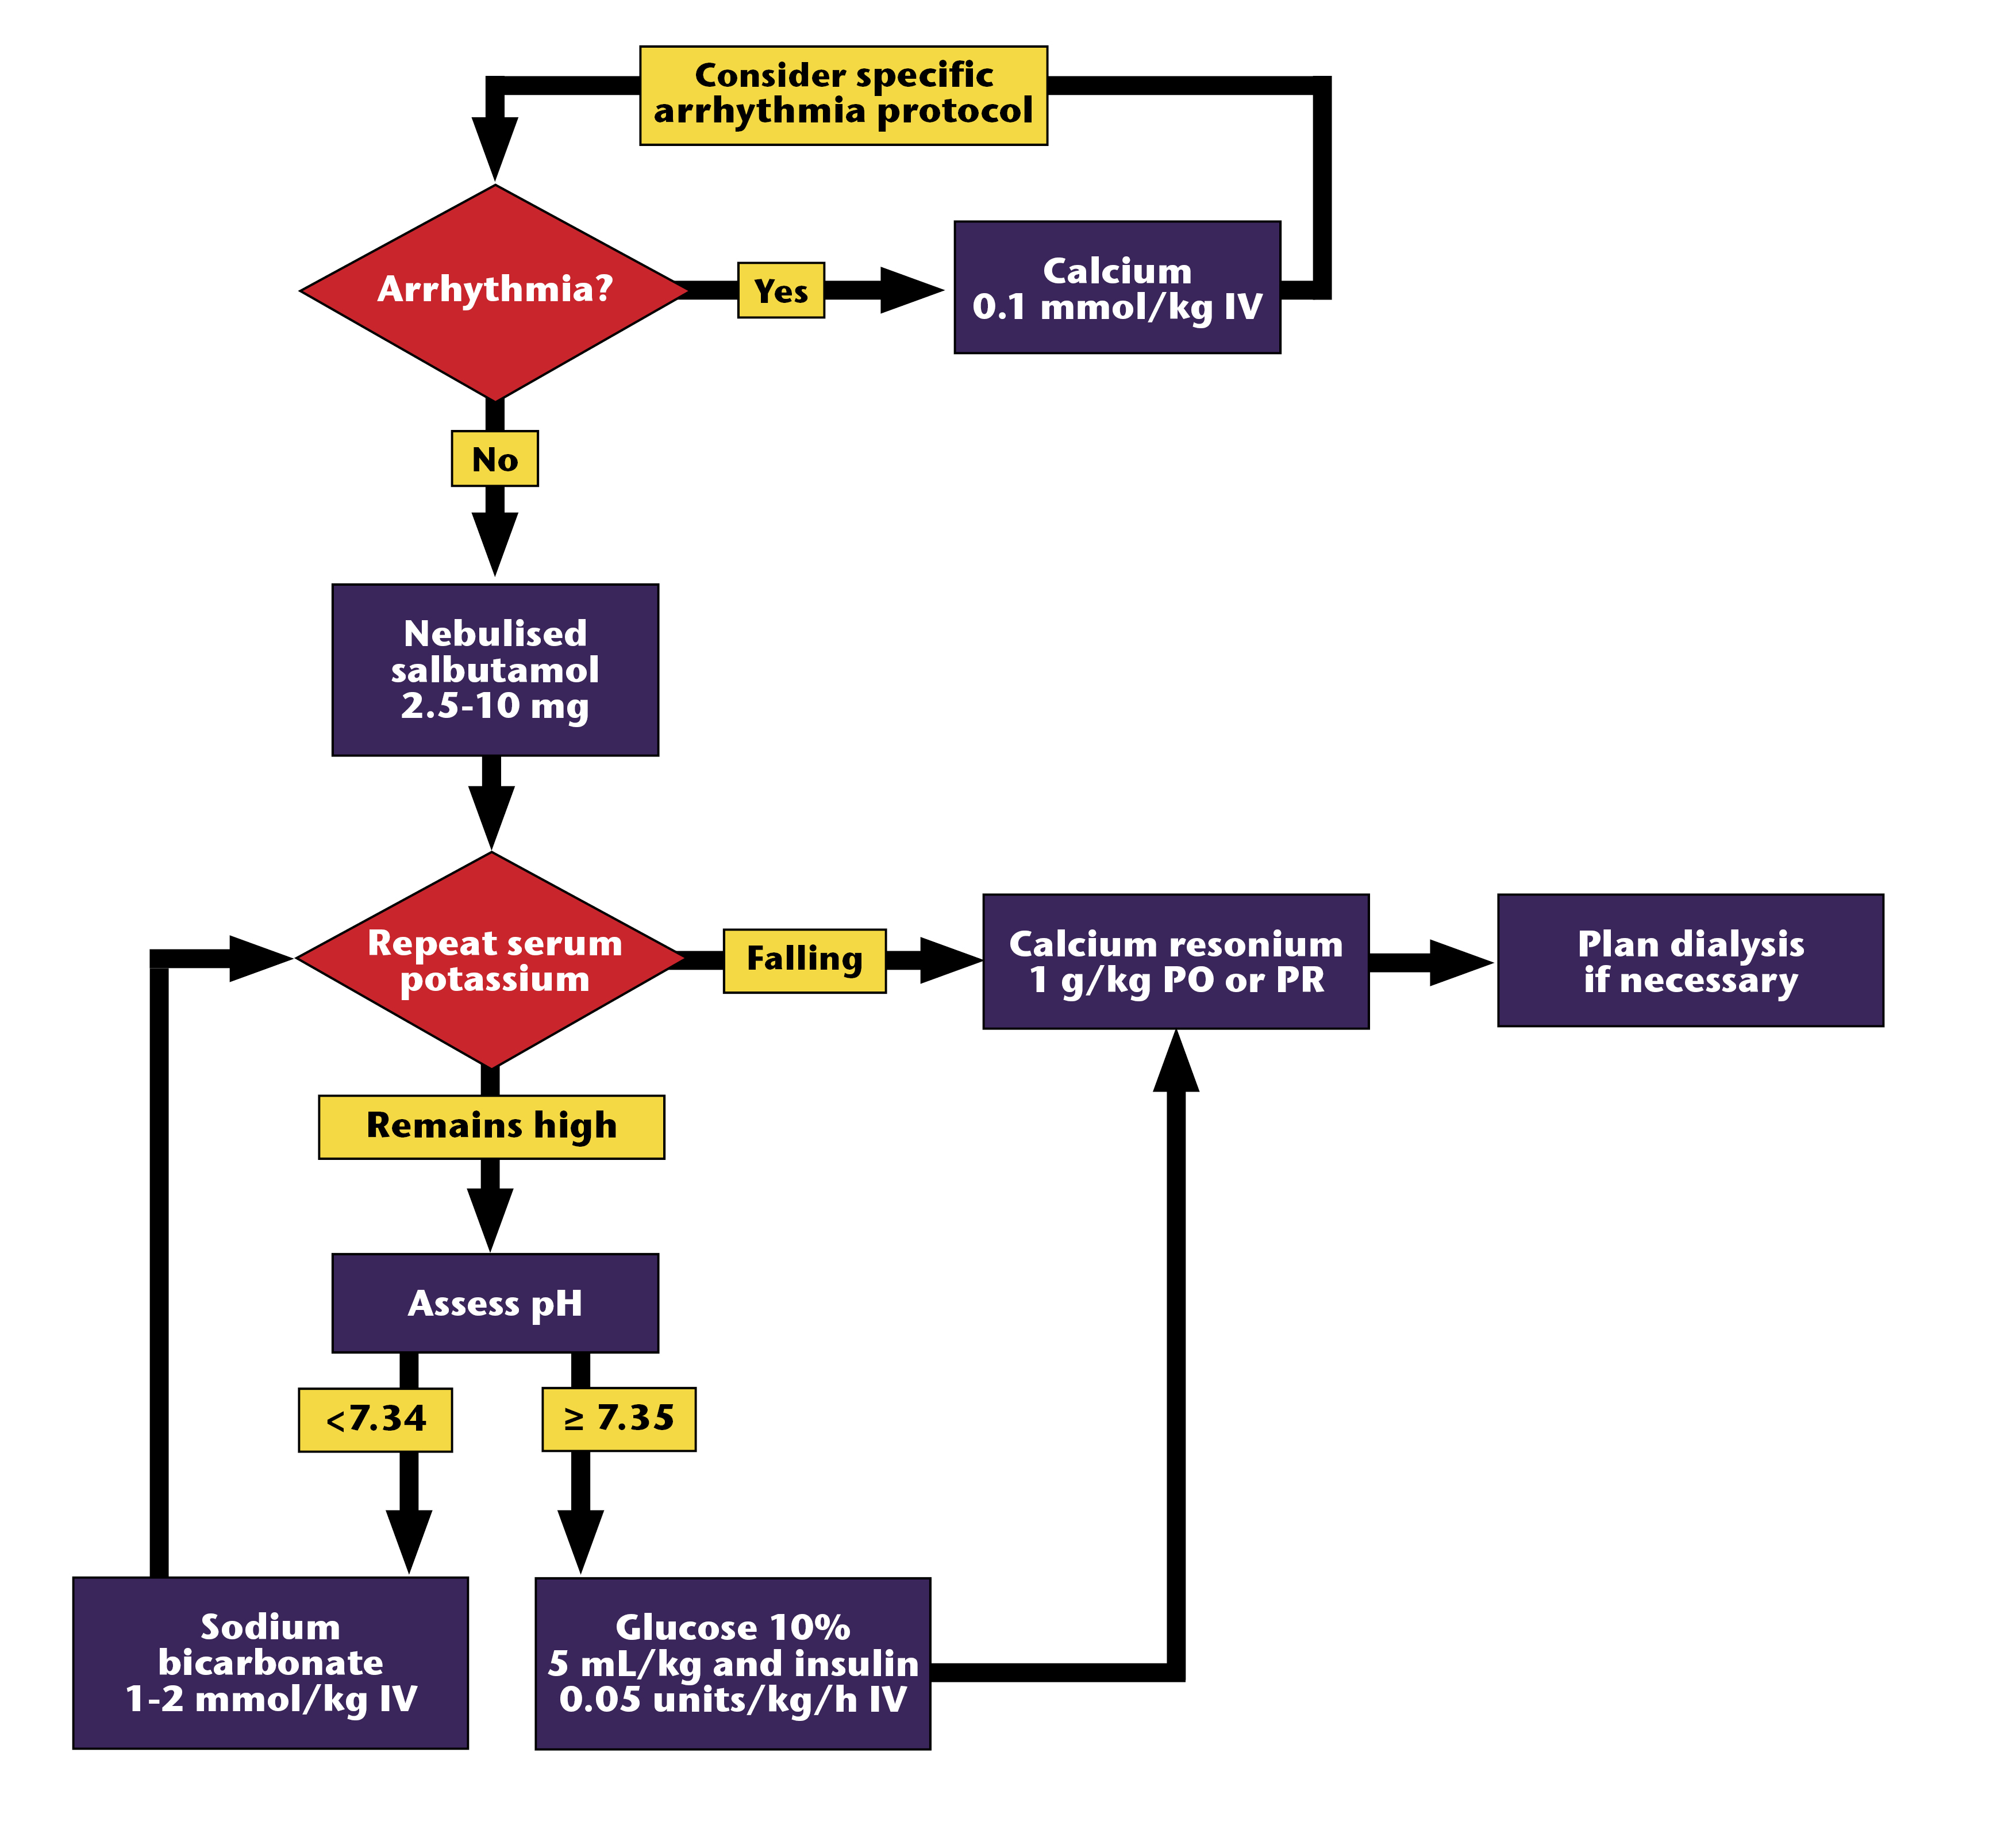 Management of hyperkalaemia algorithm